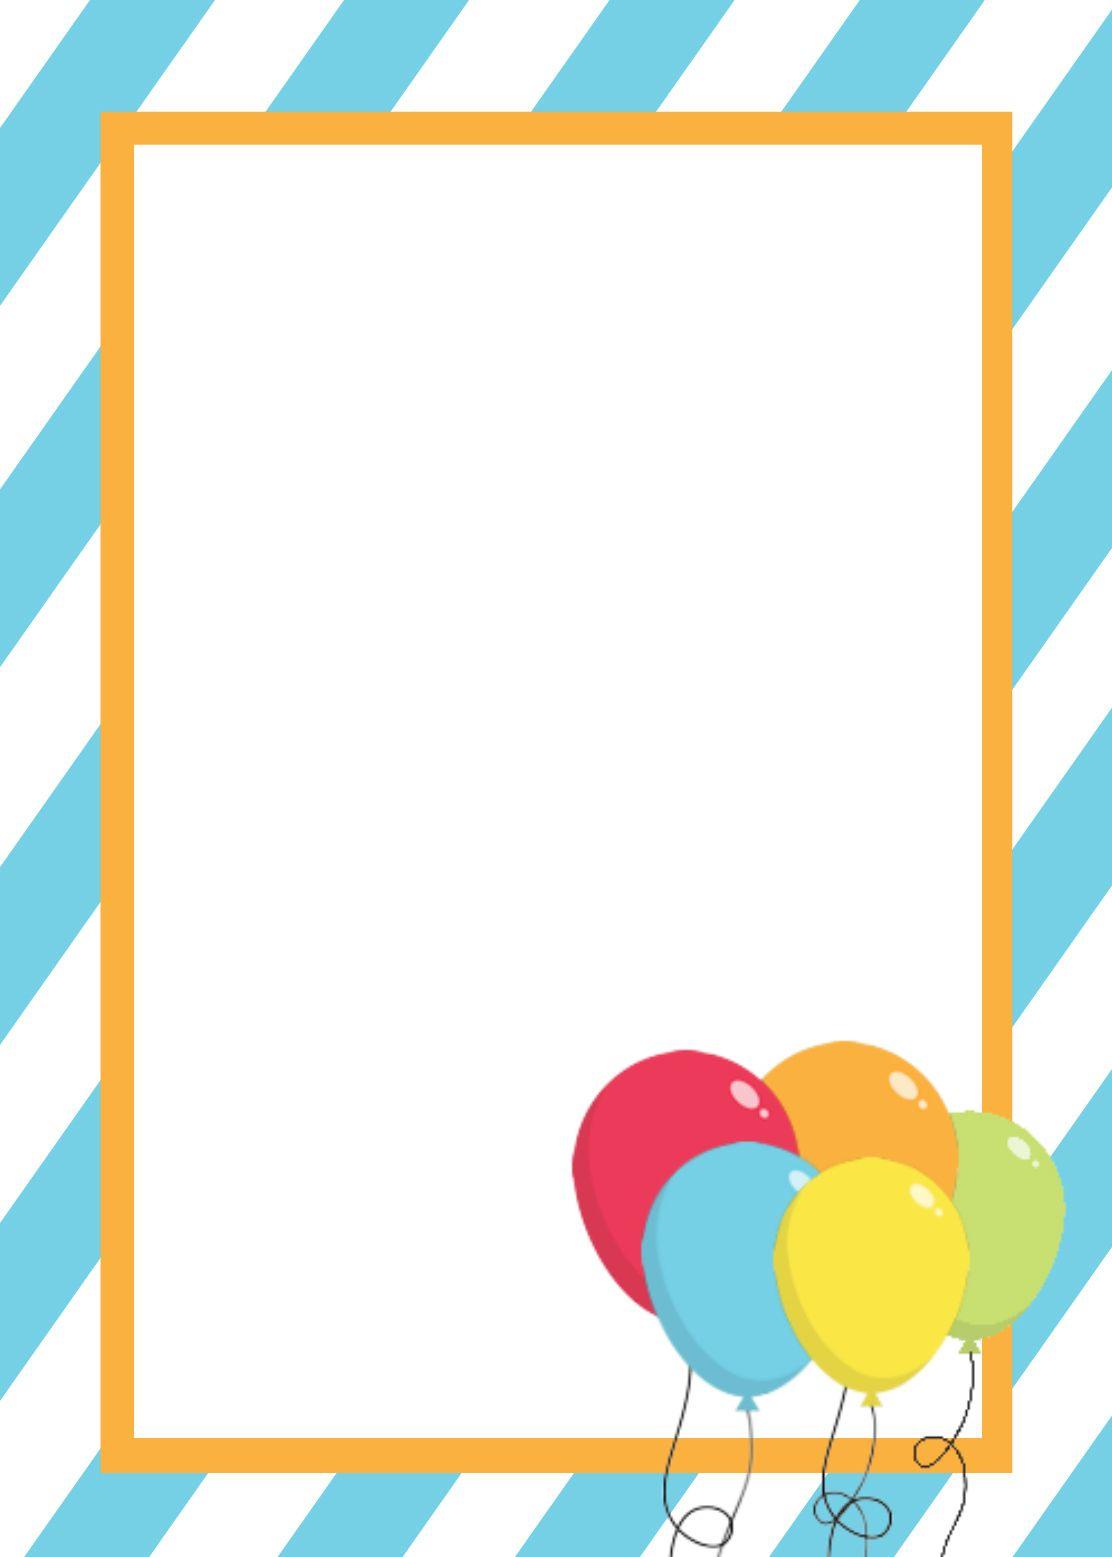 Free Printable Birthday Invitation Templates   Birthday Ideas And - Free Printable Party Invitations